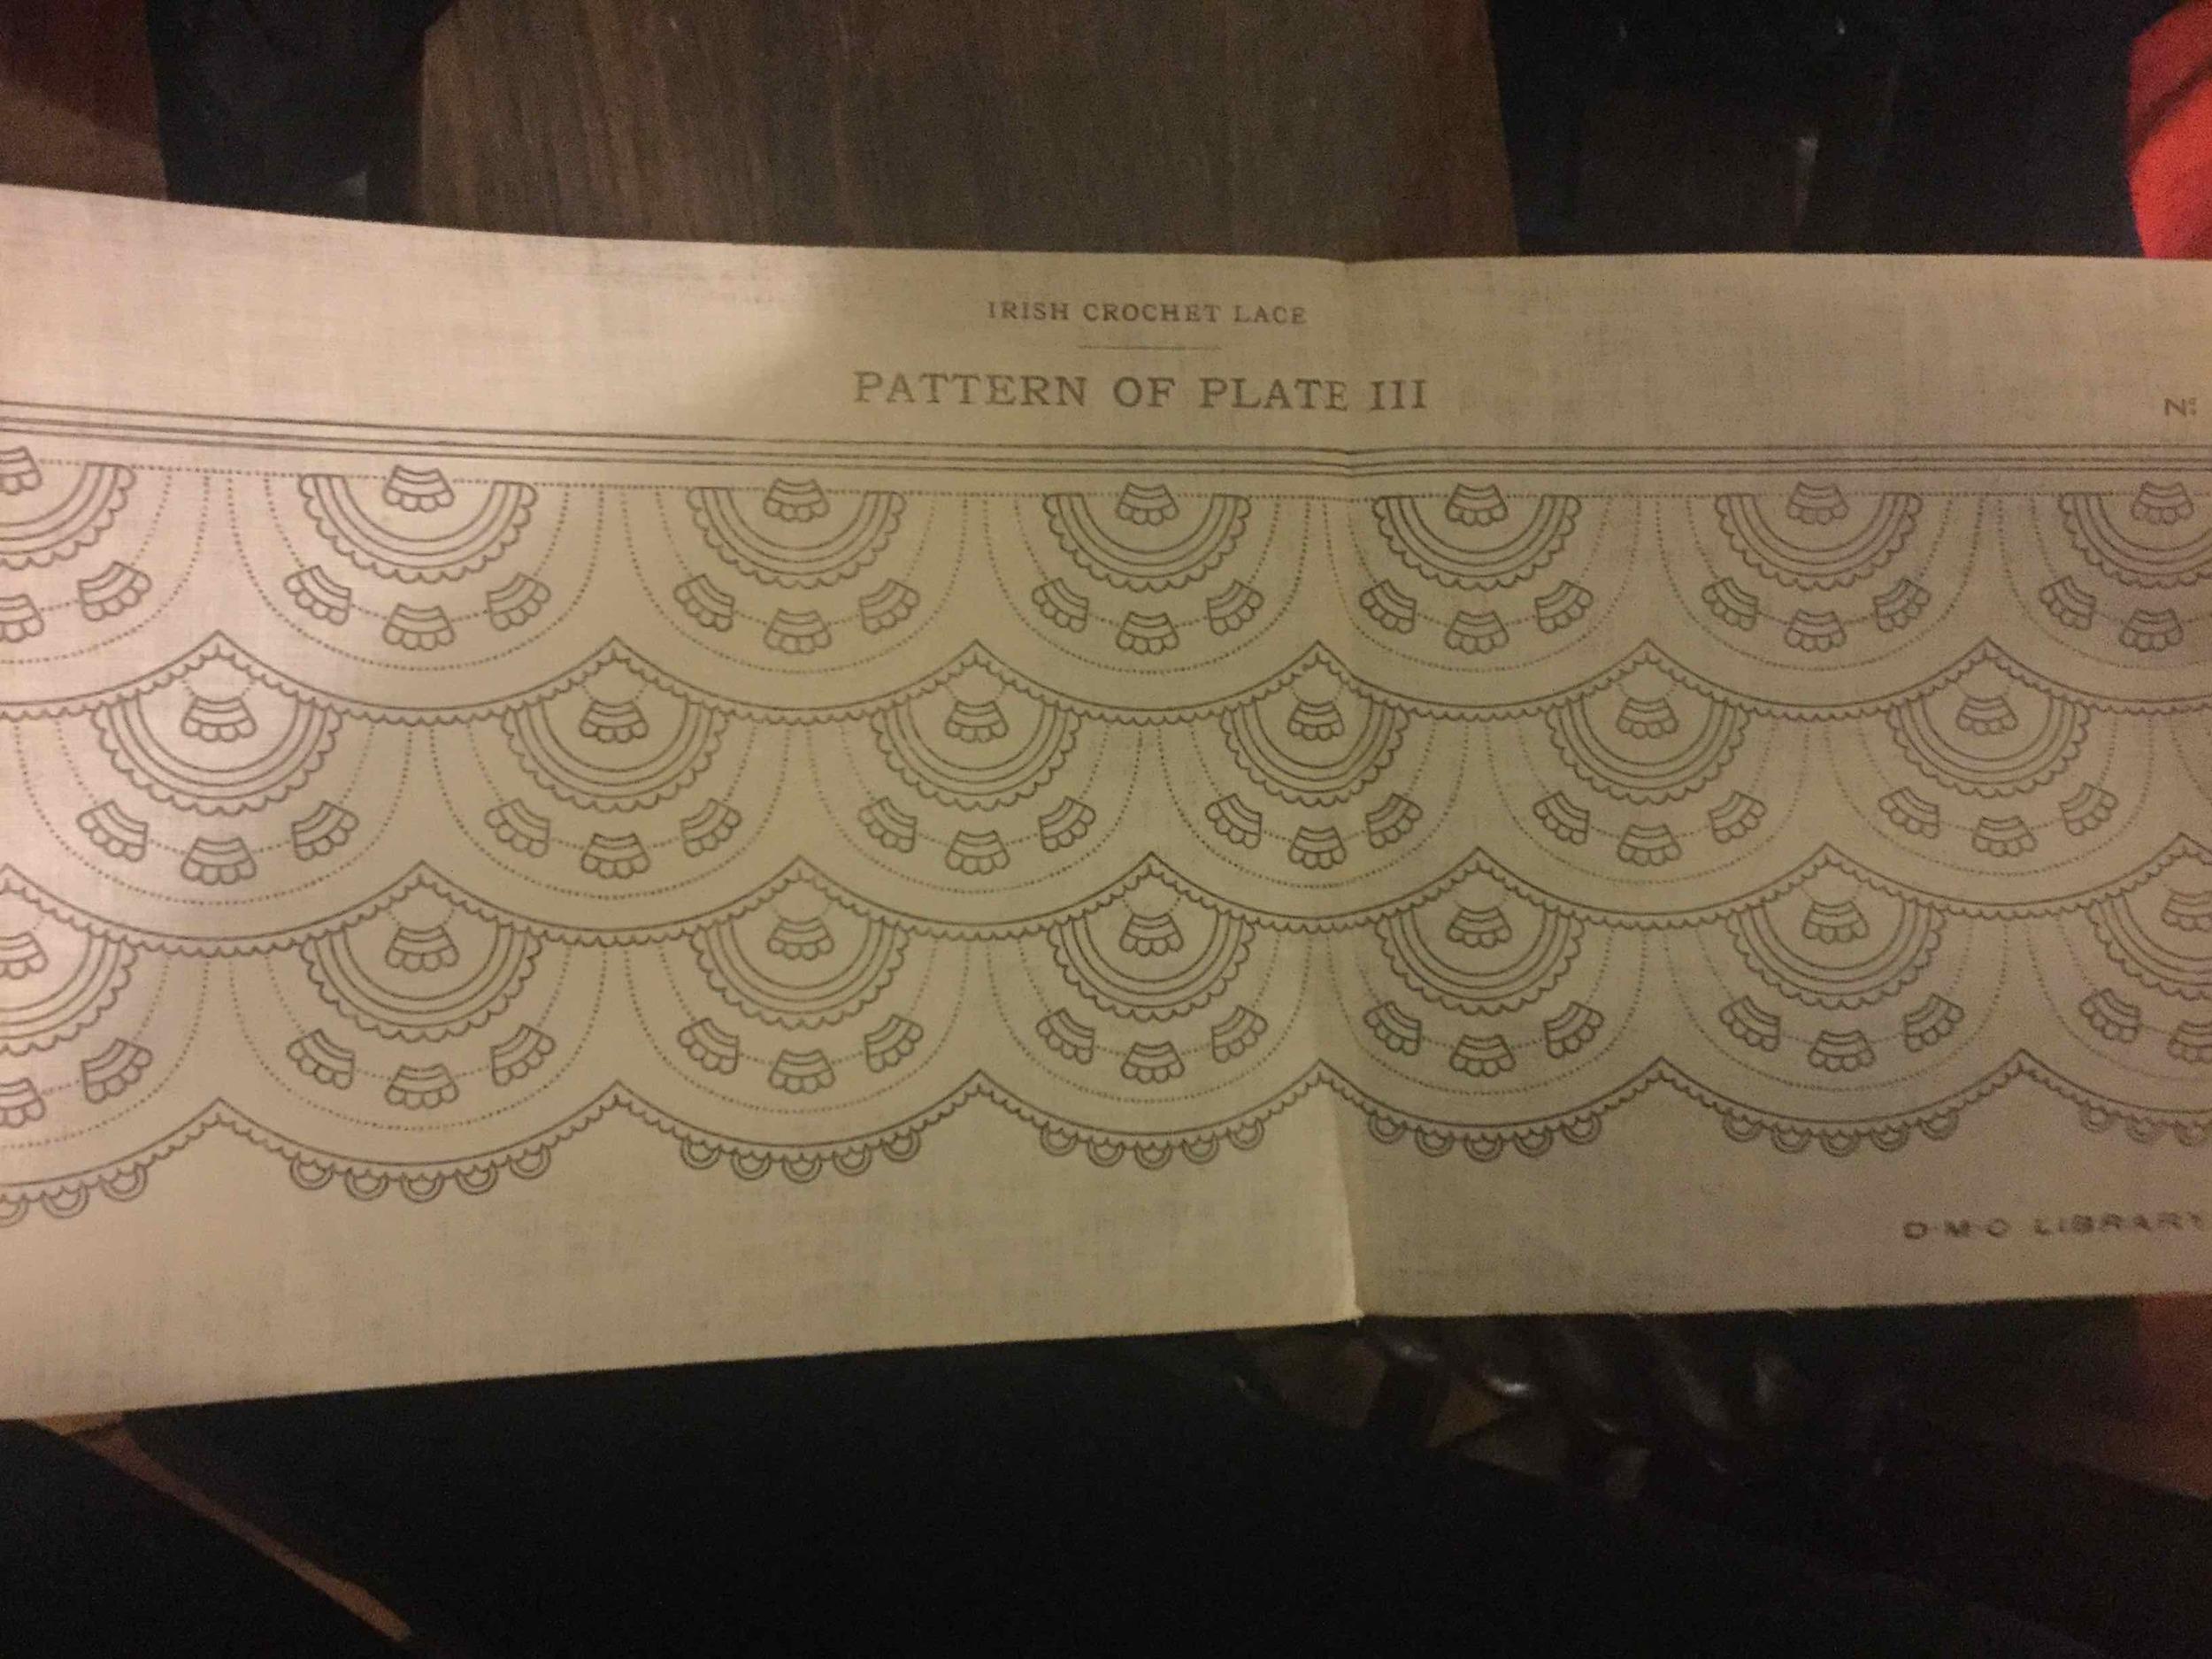 Pattern plate